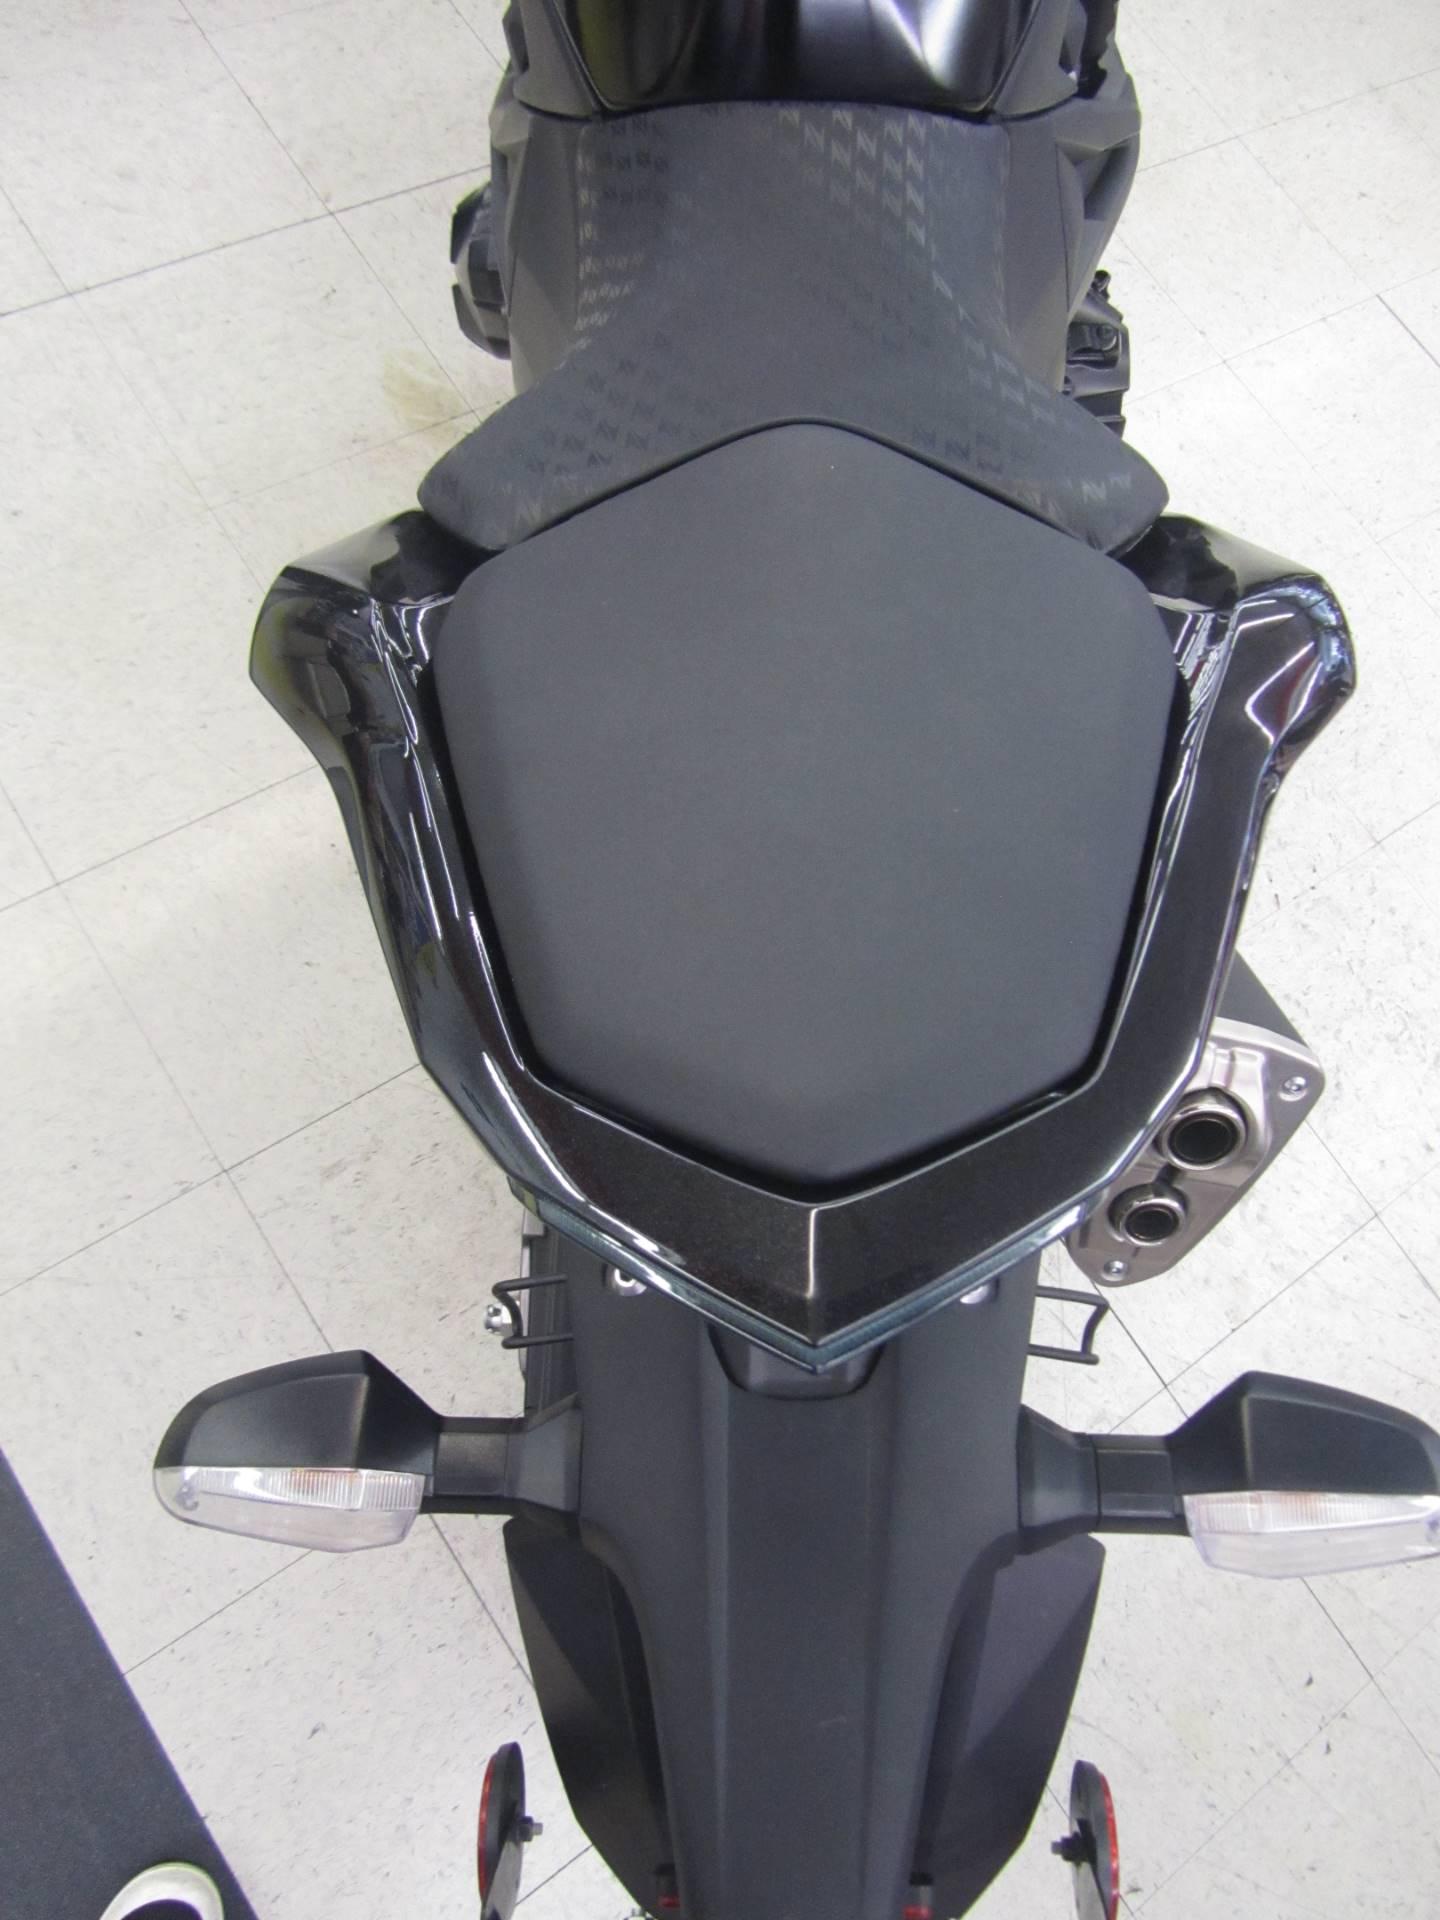 2016 Kawasaki Z800 ABS in Colorado Springs, Colorado